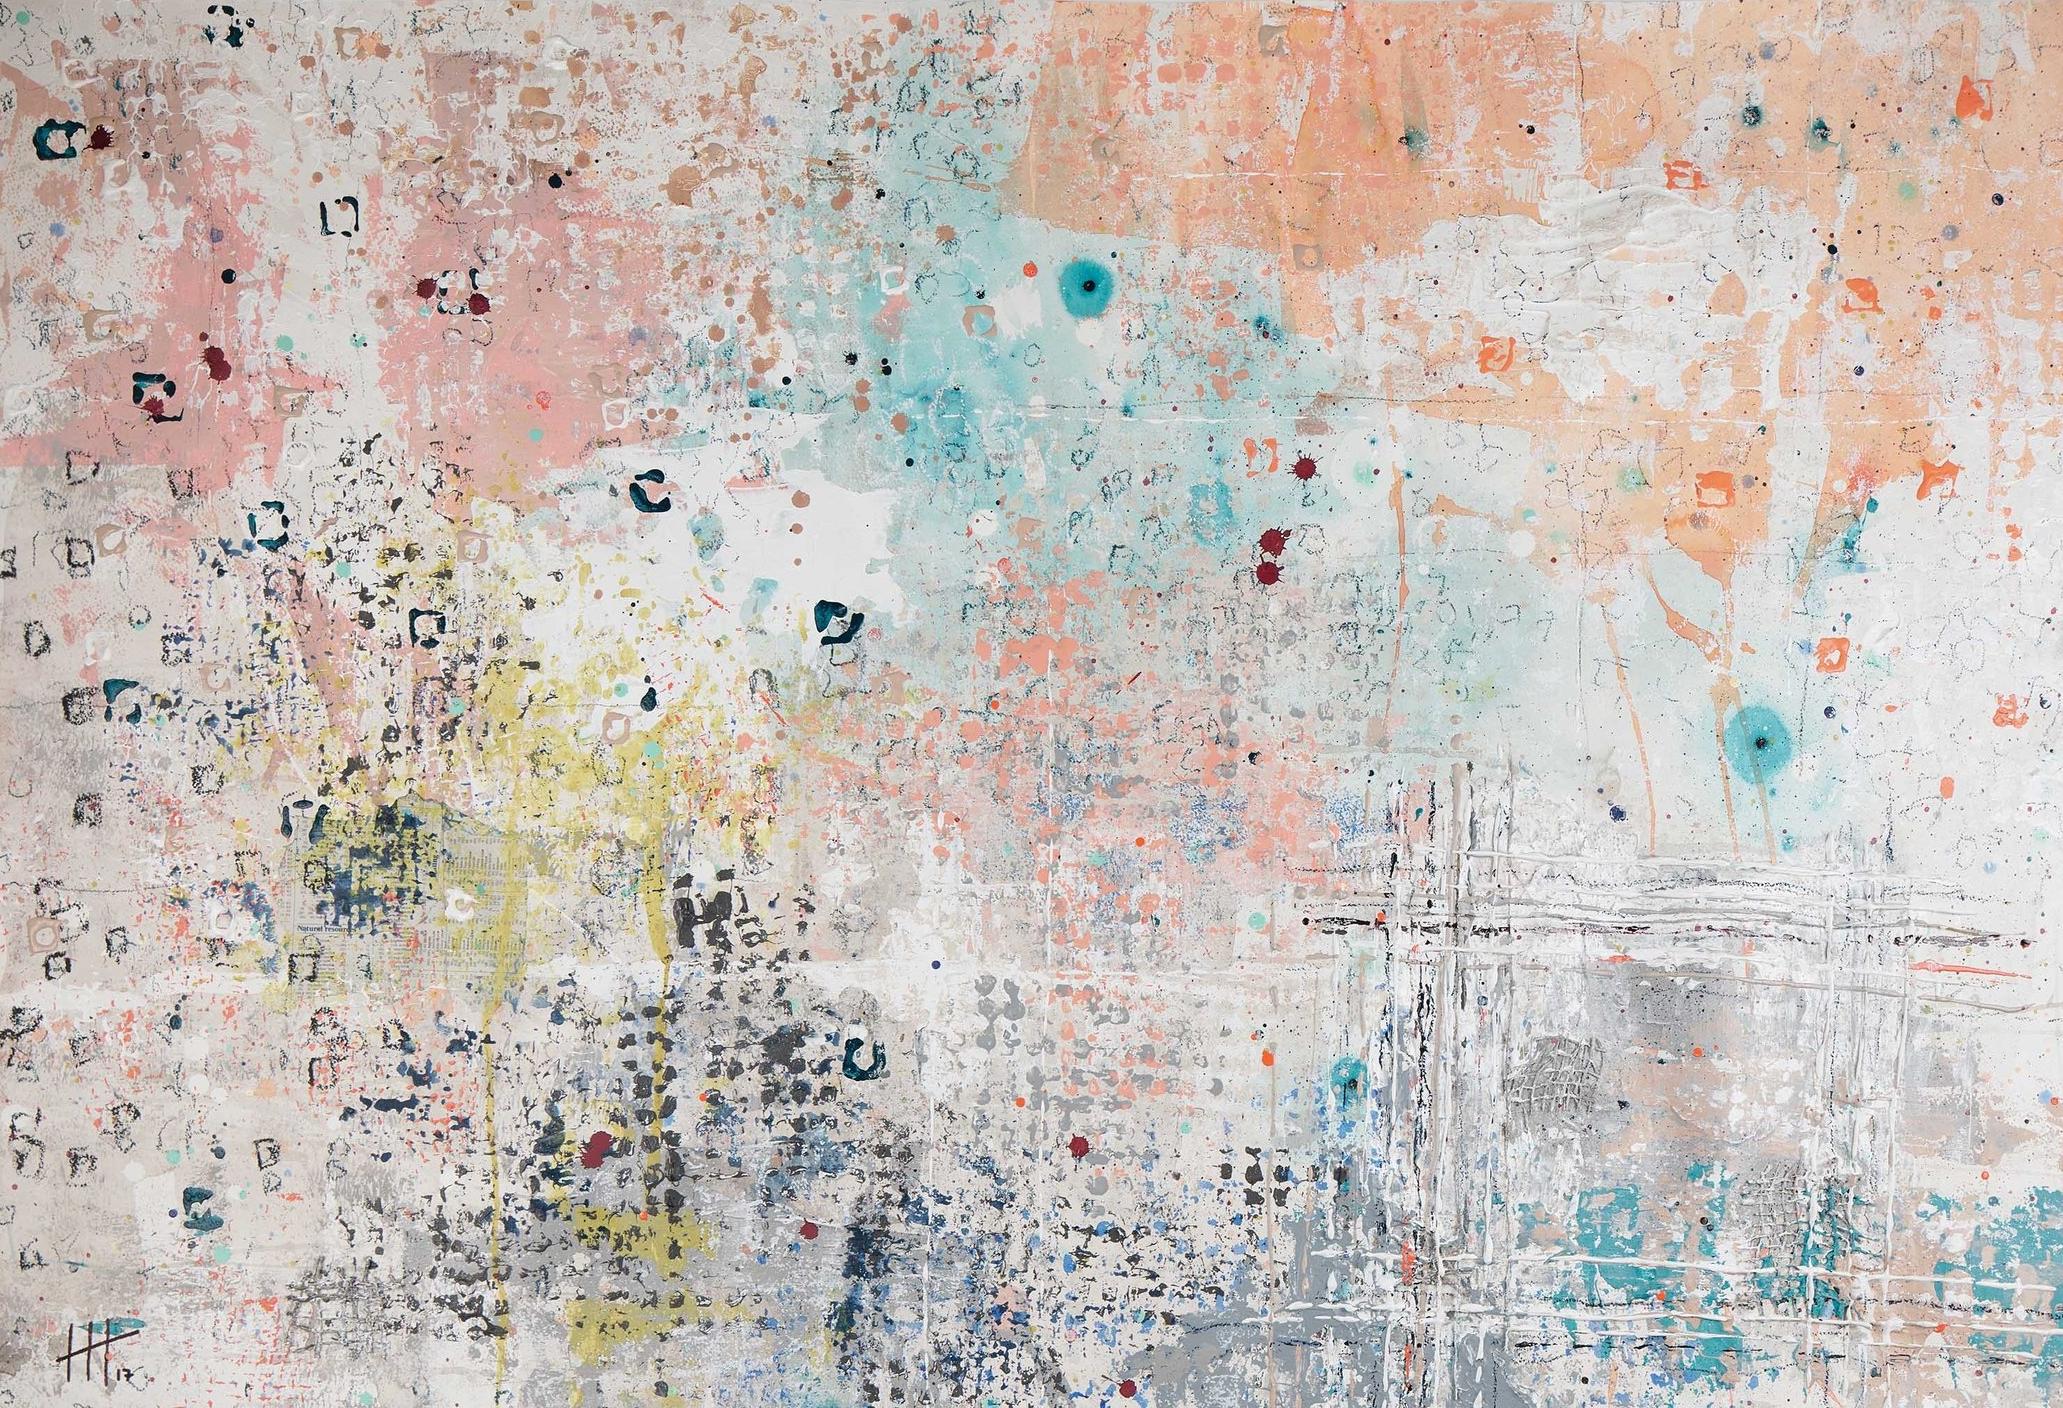 'A. Delis' Acrylic & Mixed Media / 101cm x 137cm (framed) SOLD